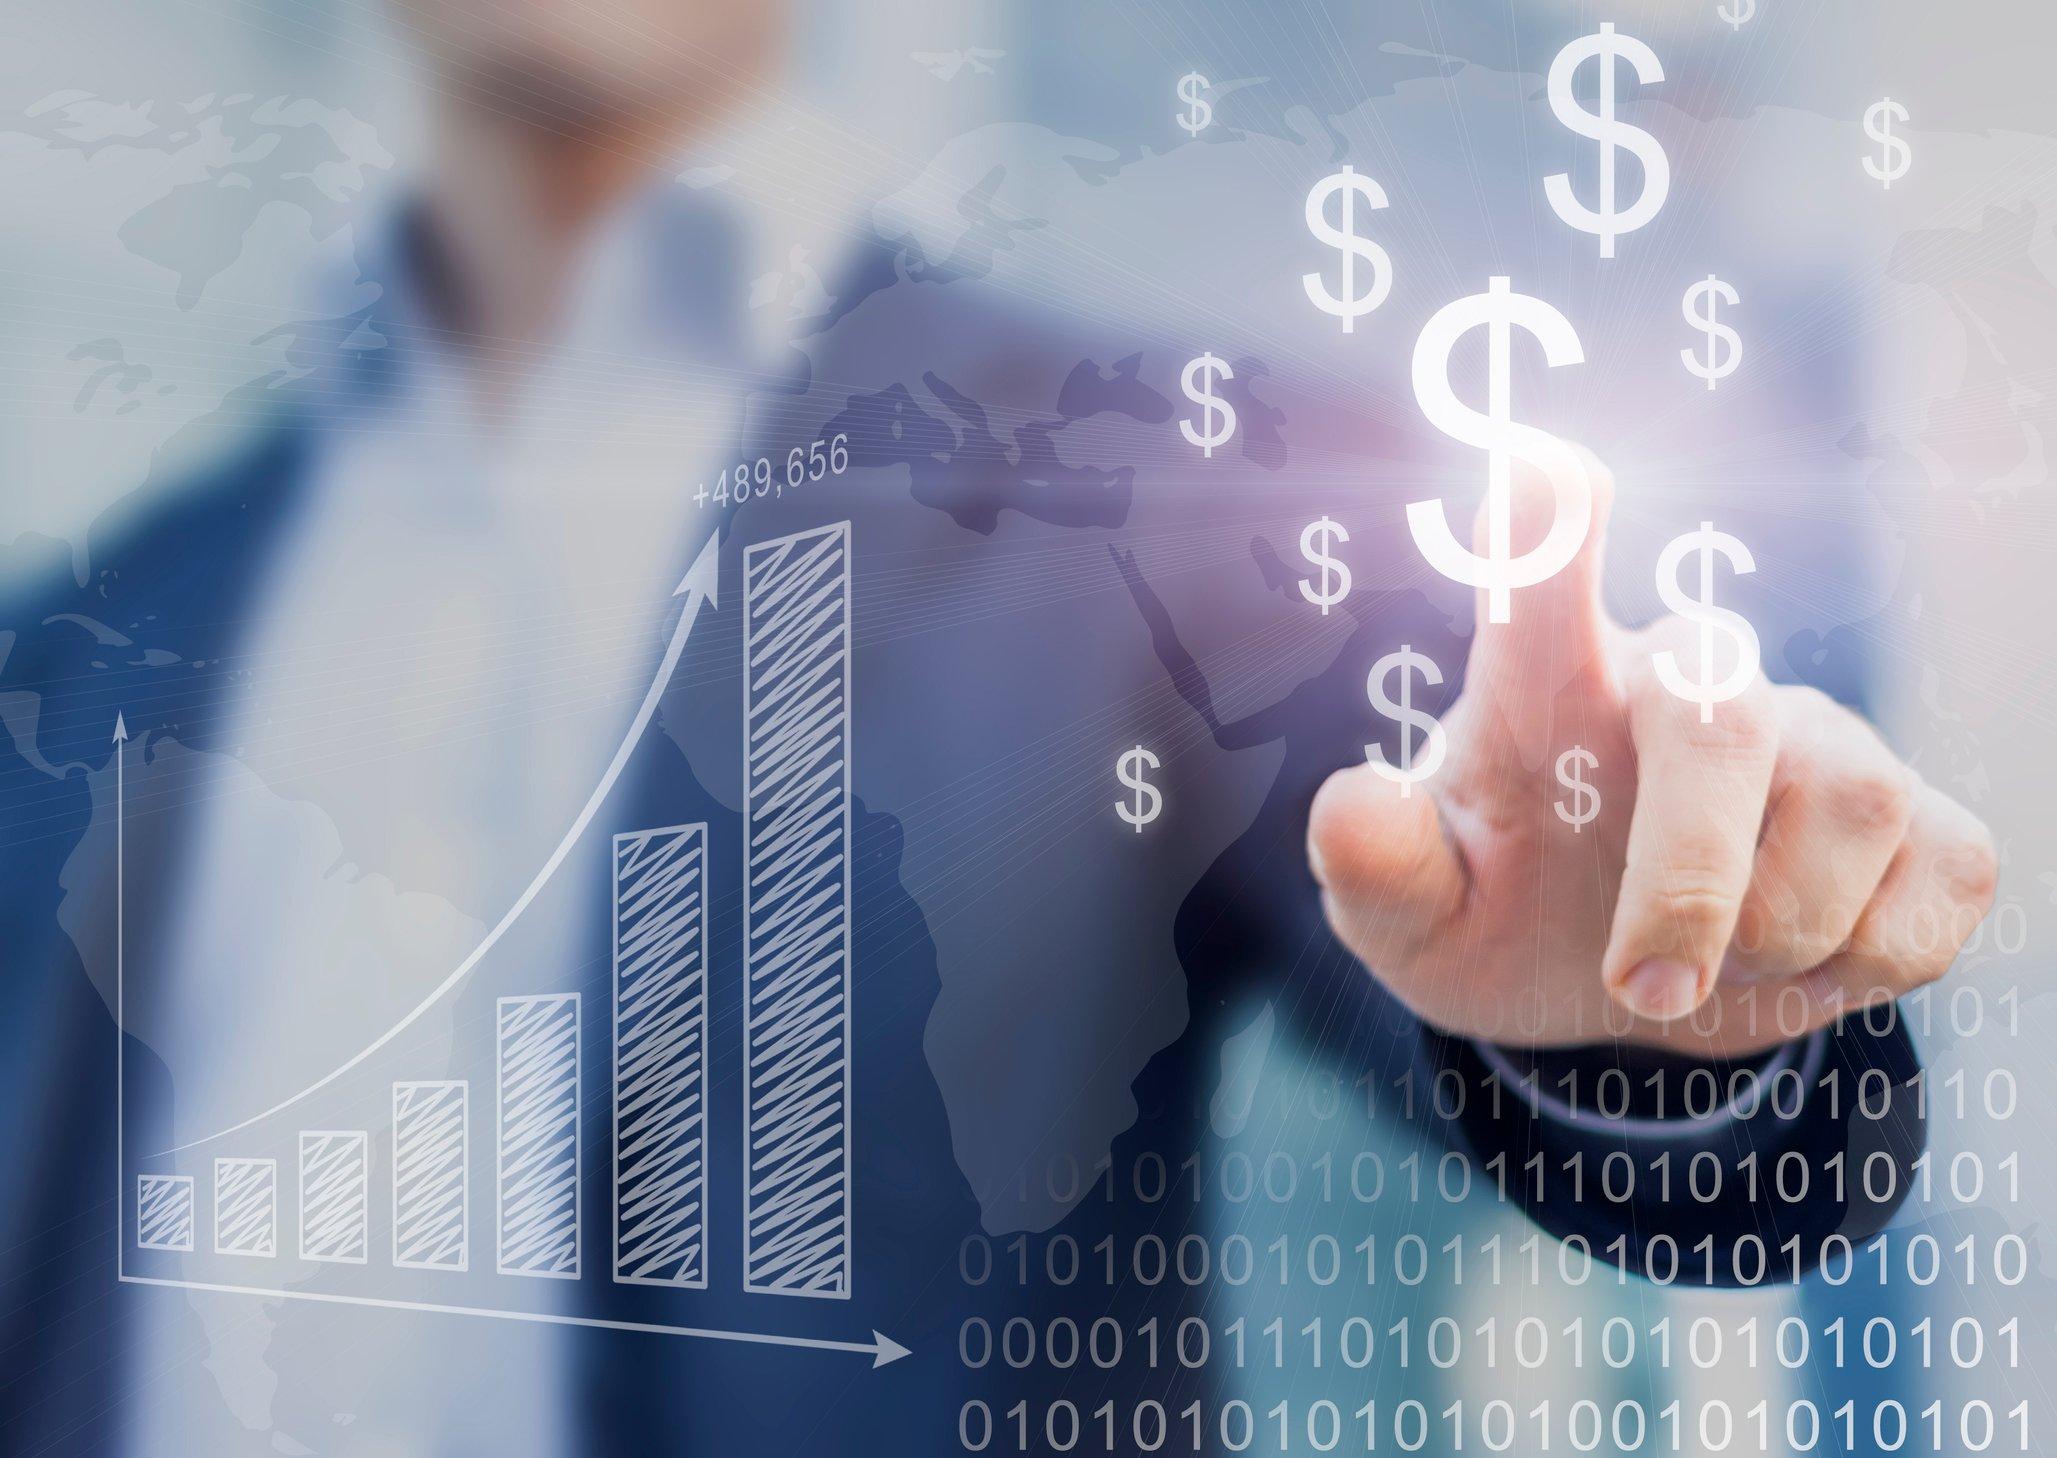 Business man touching digital dollar signs